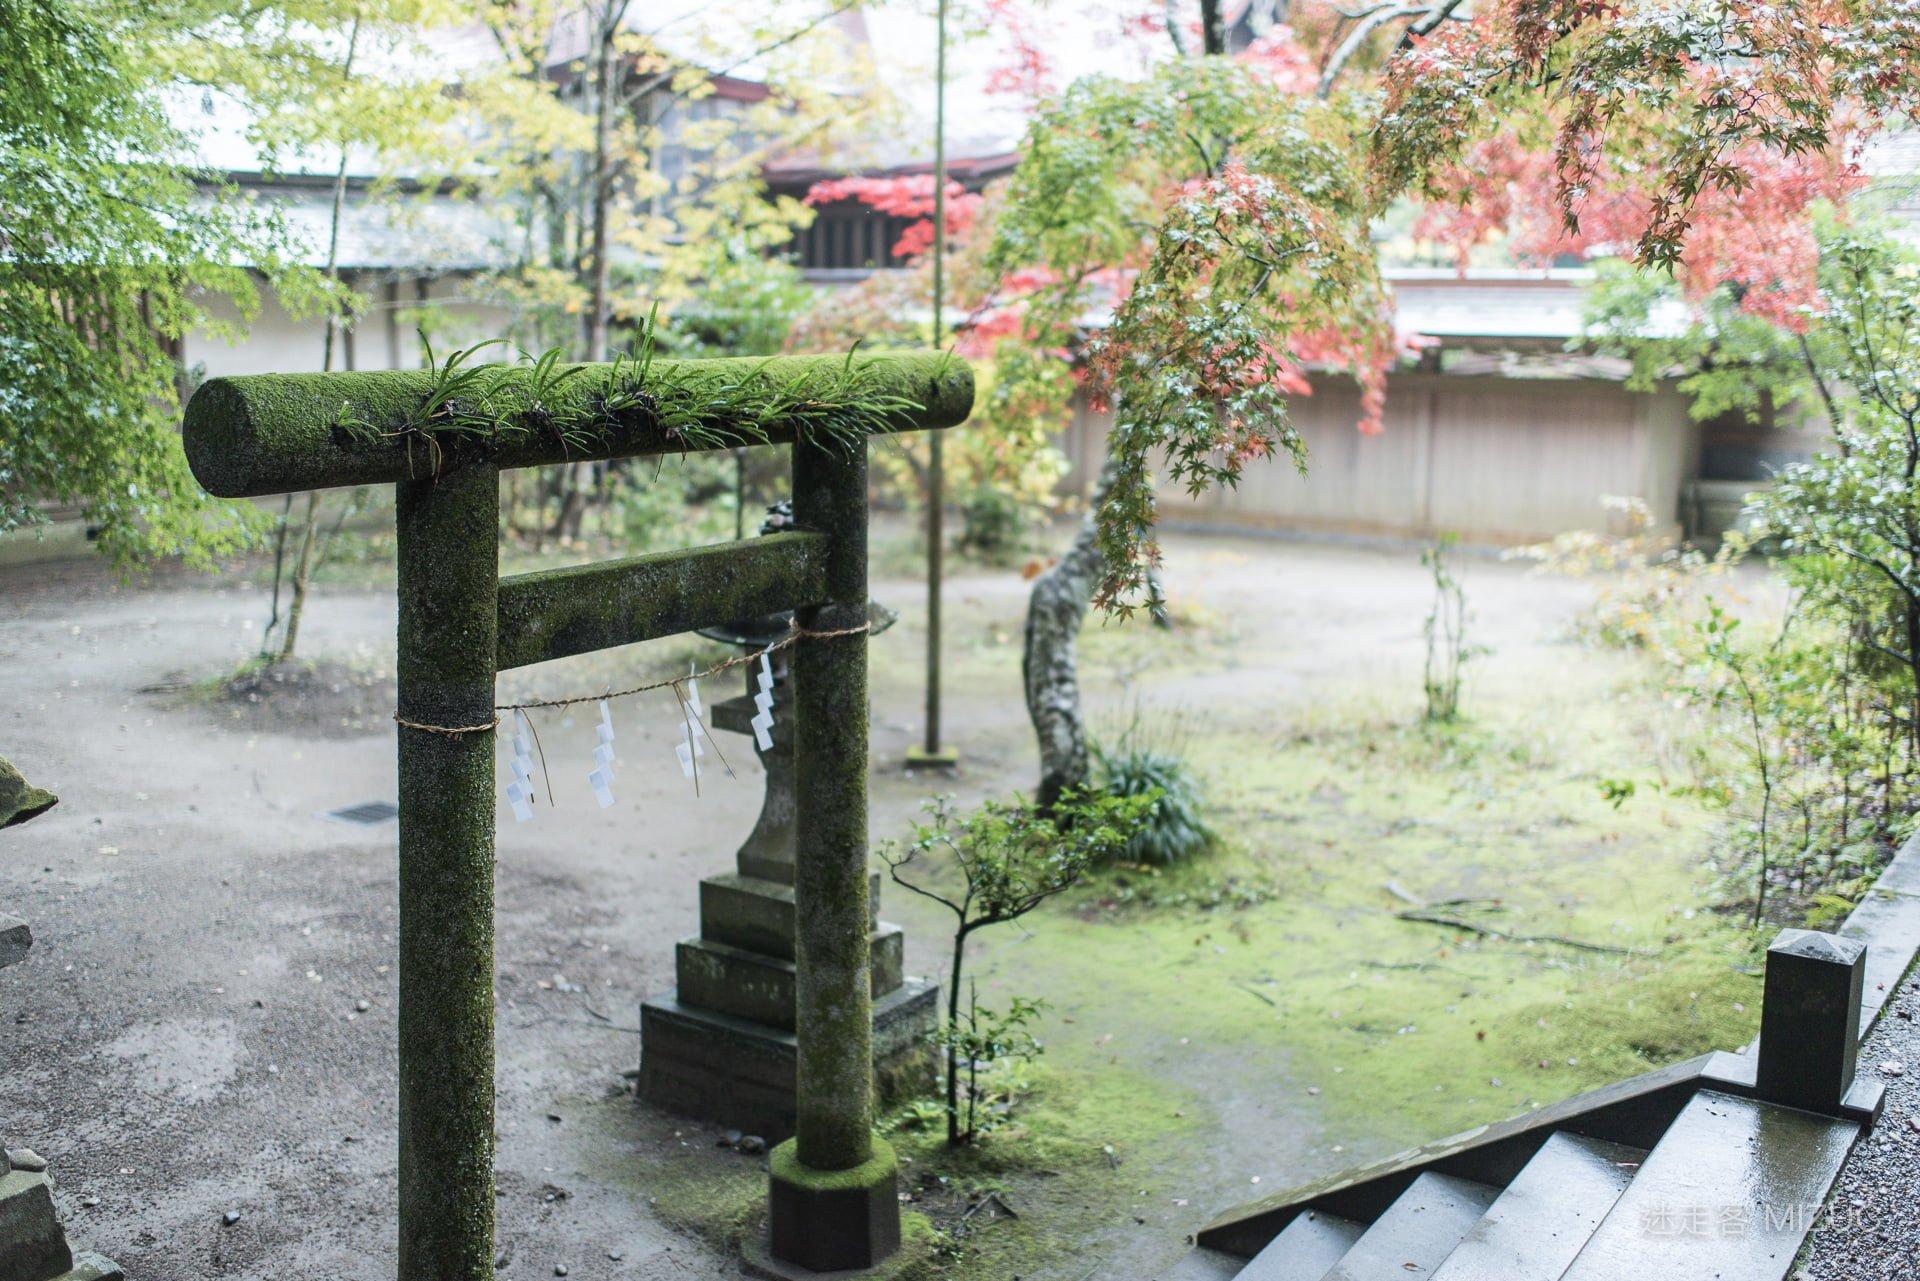 201711 Ibaraki Tochigi Gunma Japan Travel By RentalCar 21 日本自駕旅遊/北關東三縣「茨城、櫪木、群馬」秋天美食、溫泉與瀑布秘境百景(精選照片分享)